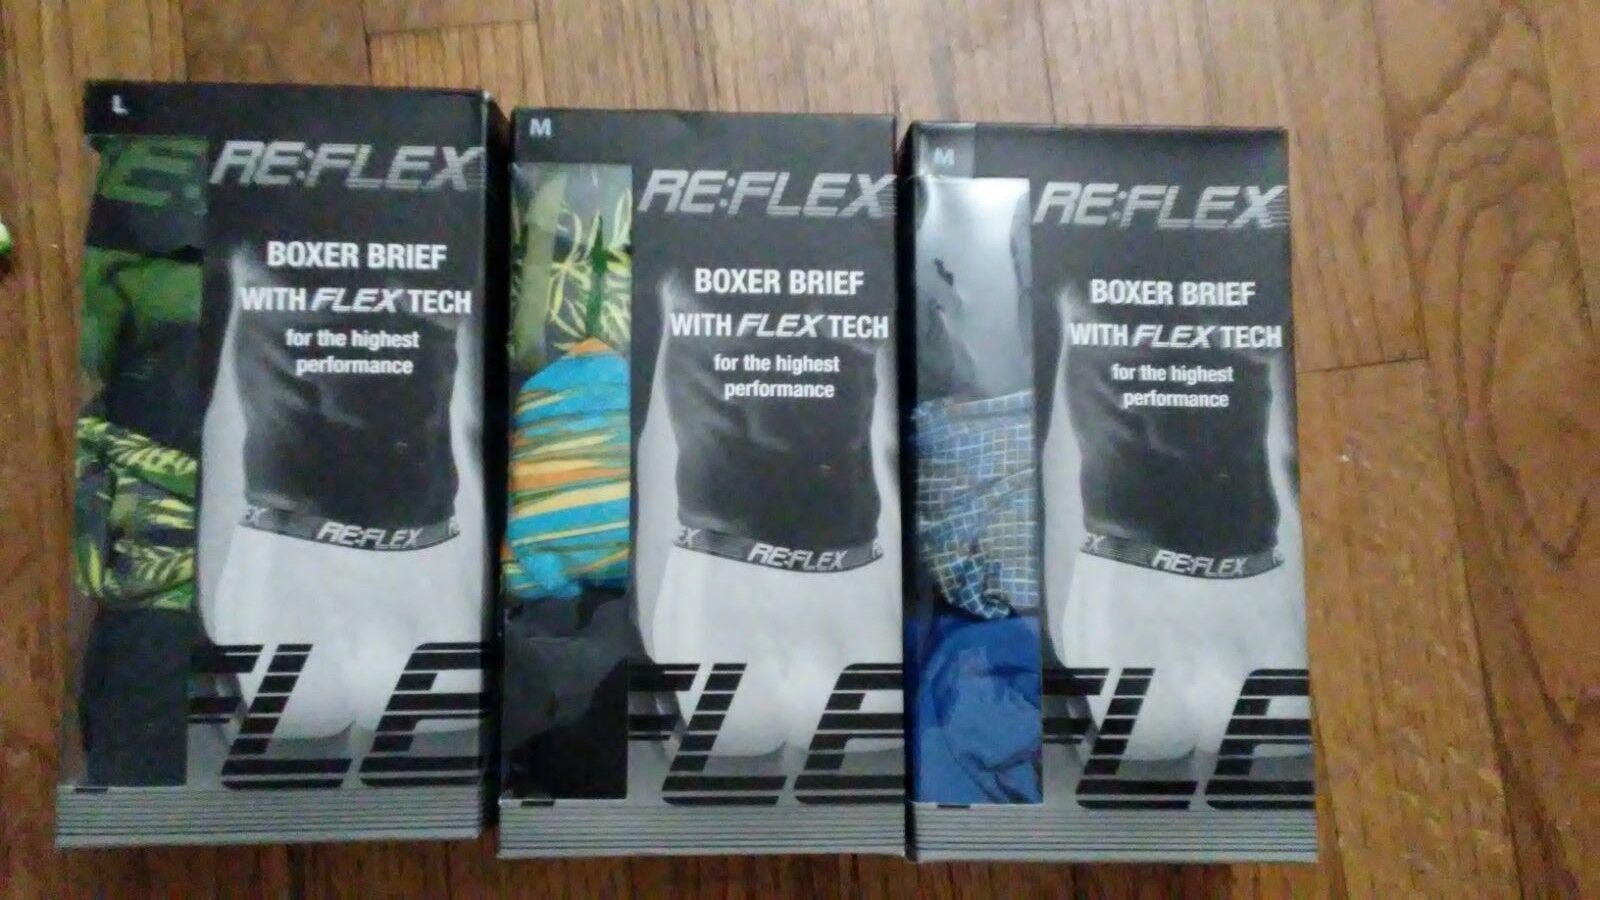 Reflex Boxer Briefs With Flex Tech For The Highest Performance M L XL